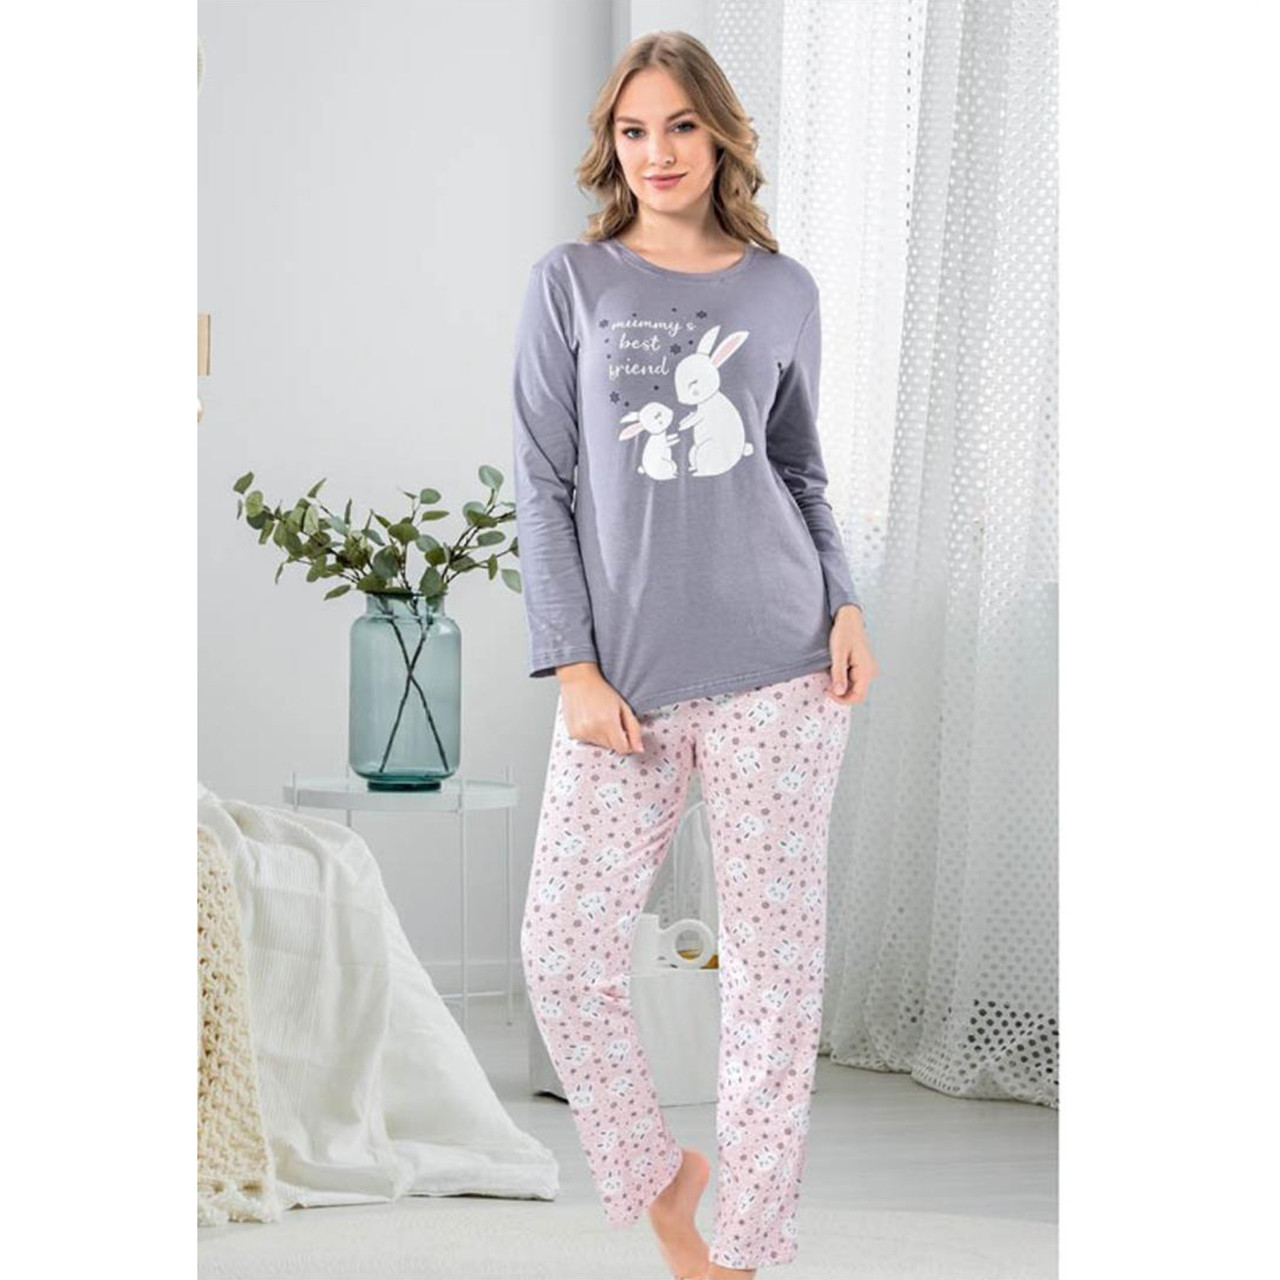 Пижама для девушек S-M-L-XL серая брючная для сна хлопковая Mummy`s best friend S